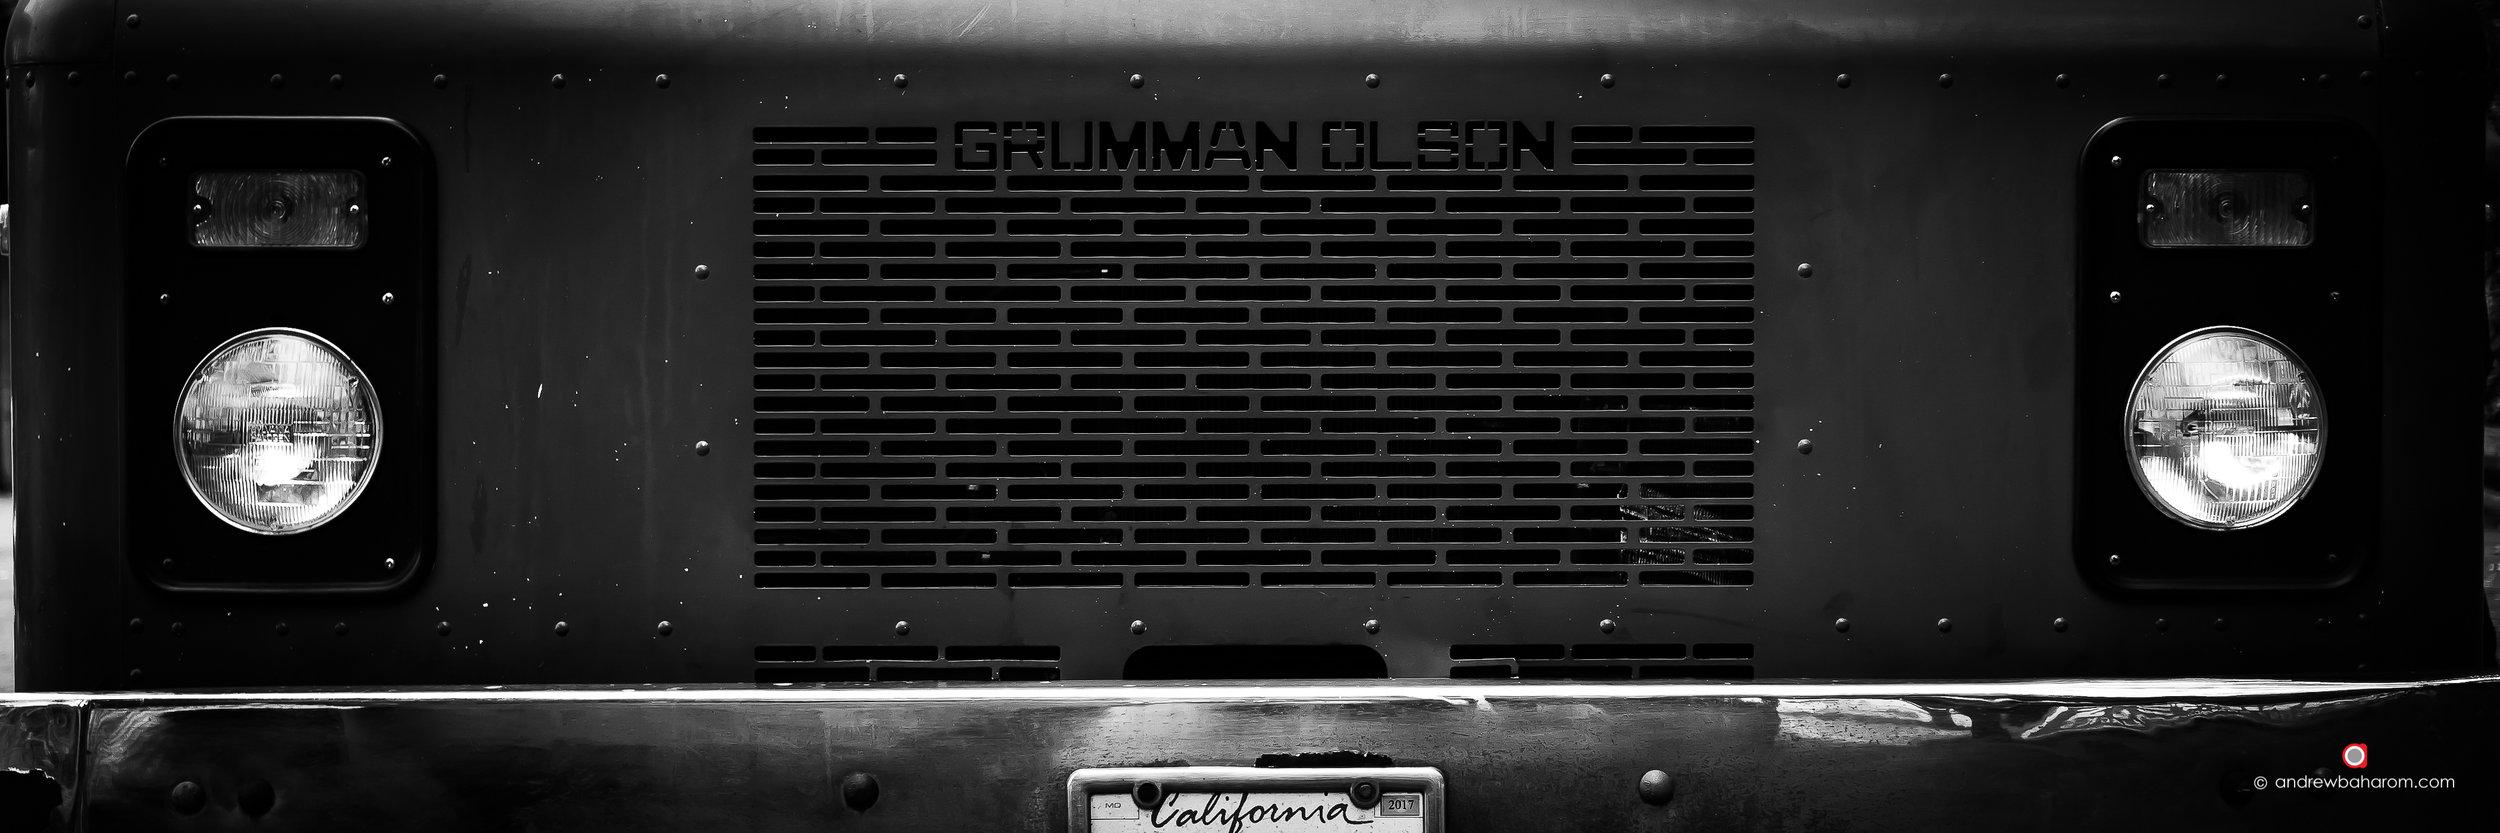 Grumman.jpg